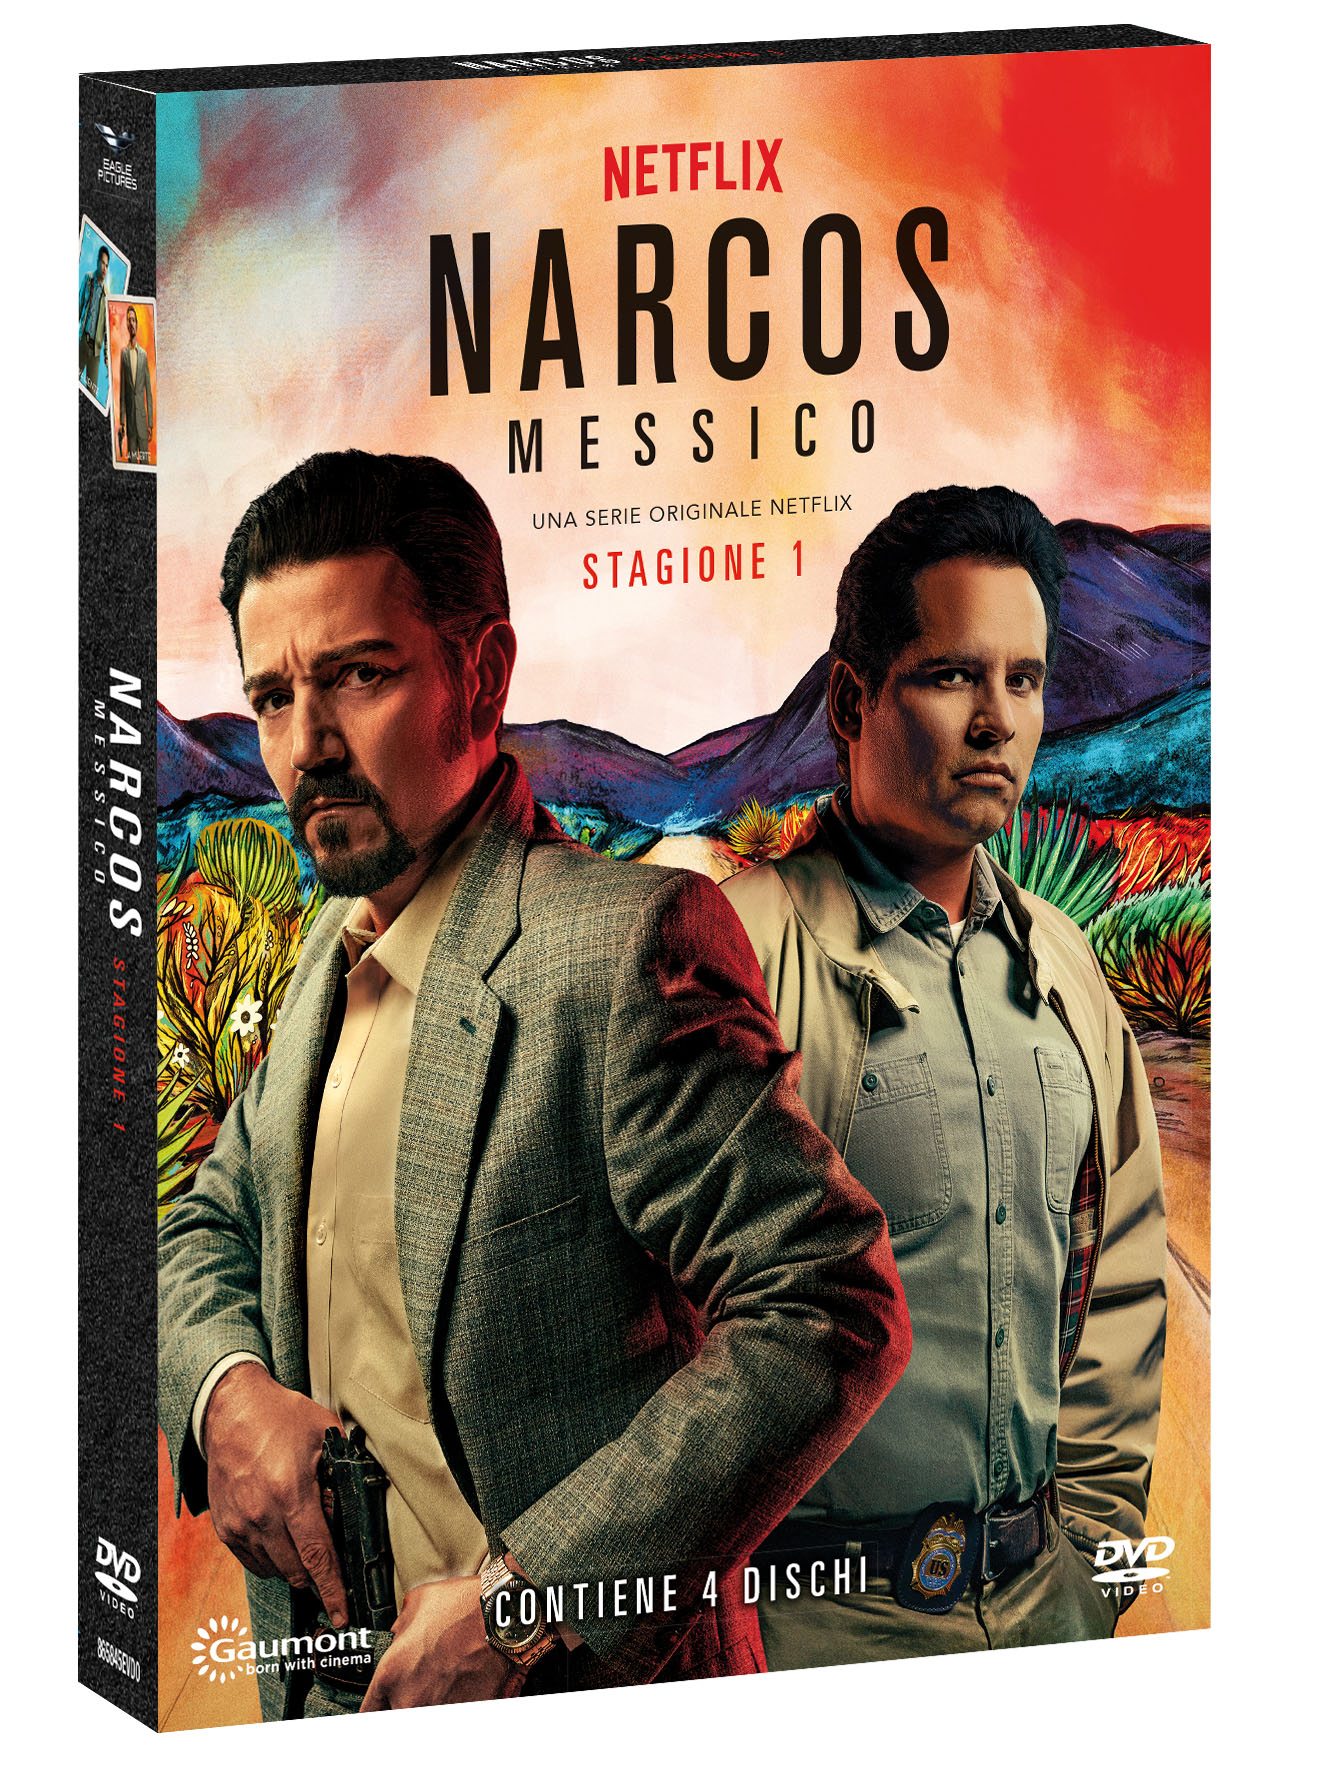 COF.NARCOS: MESSICO - STAGIONE 01 (4 DVD) (DVD)